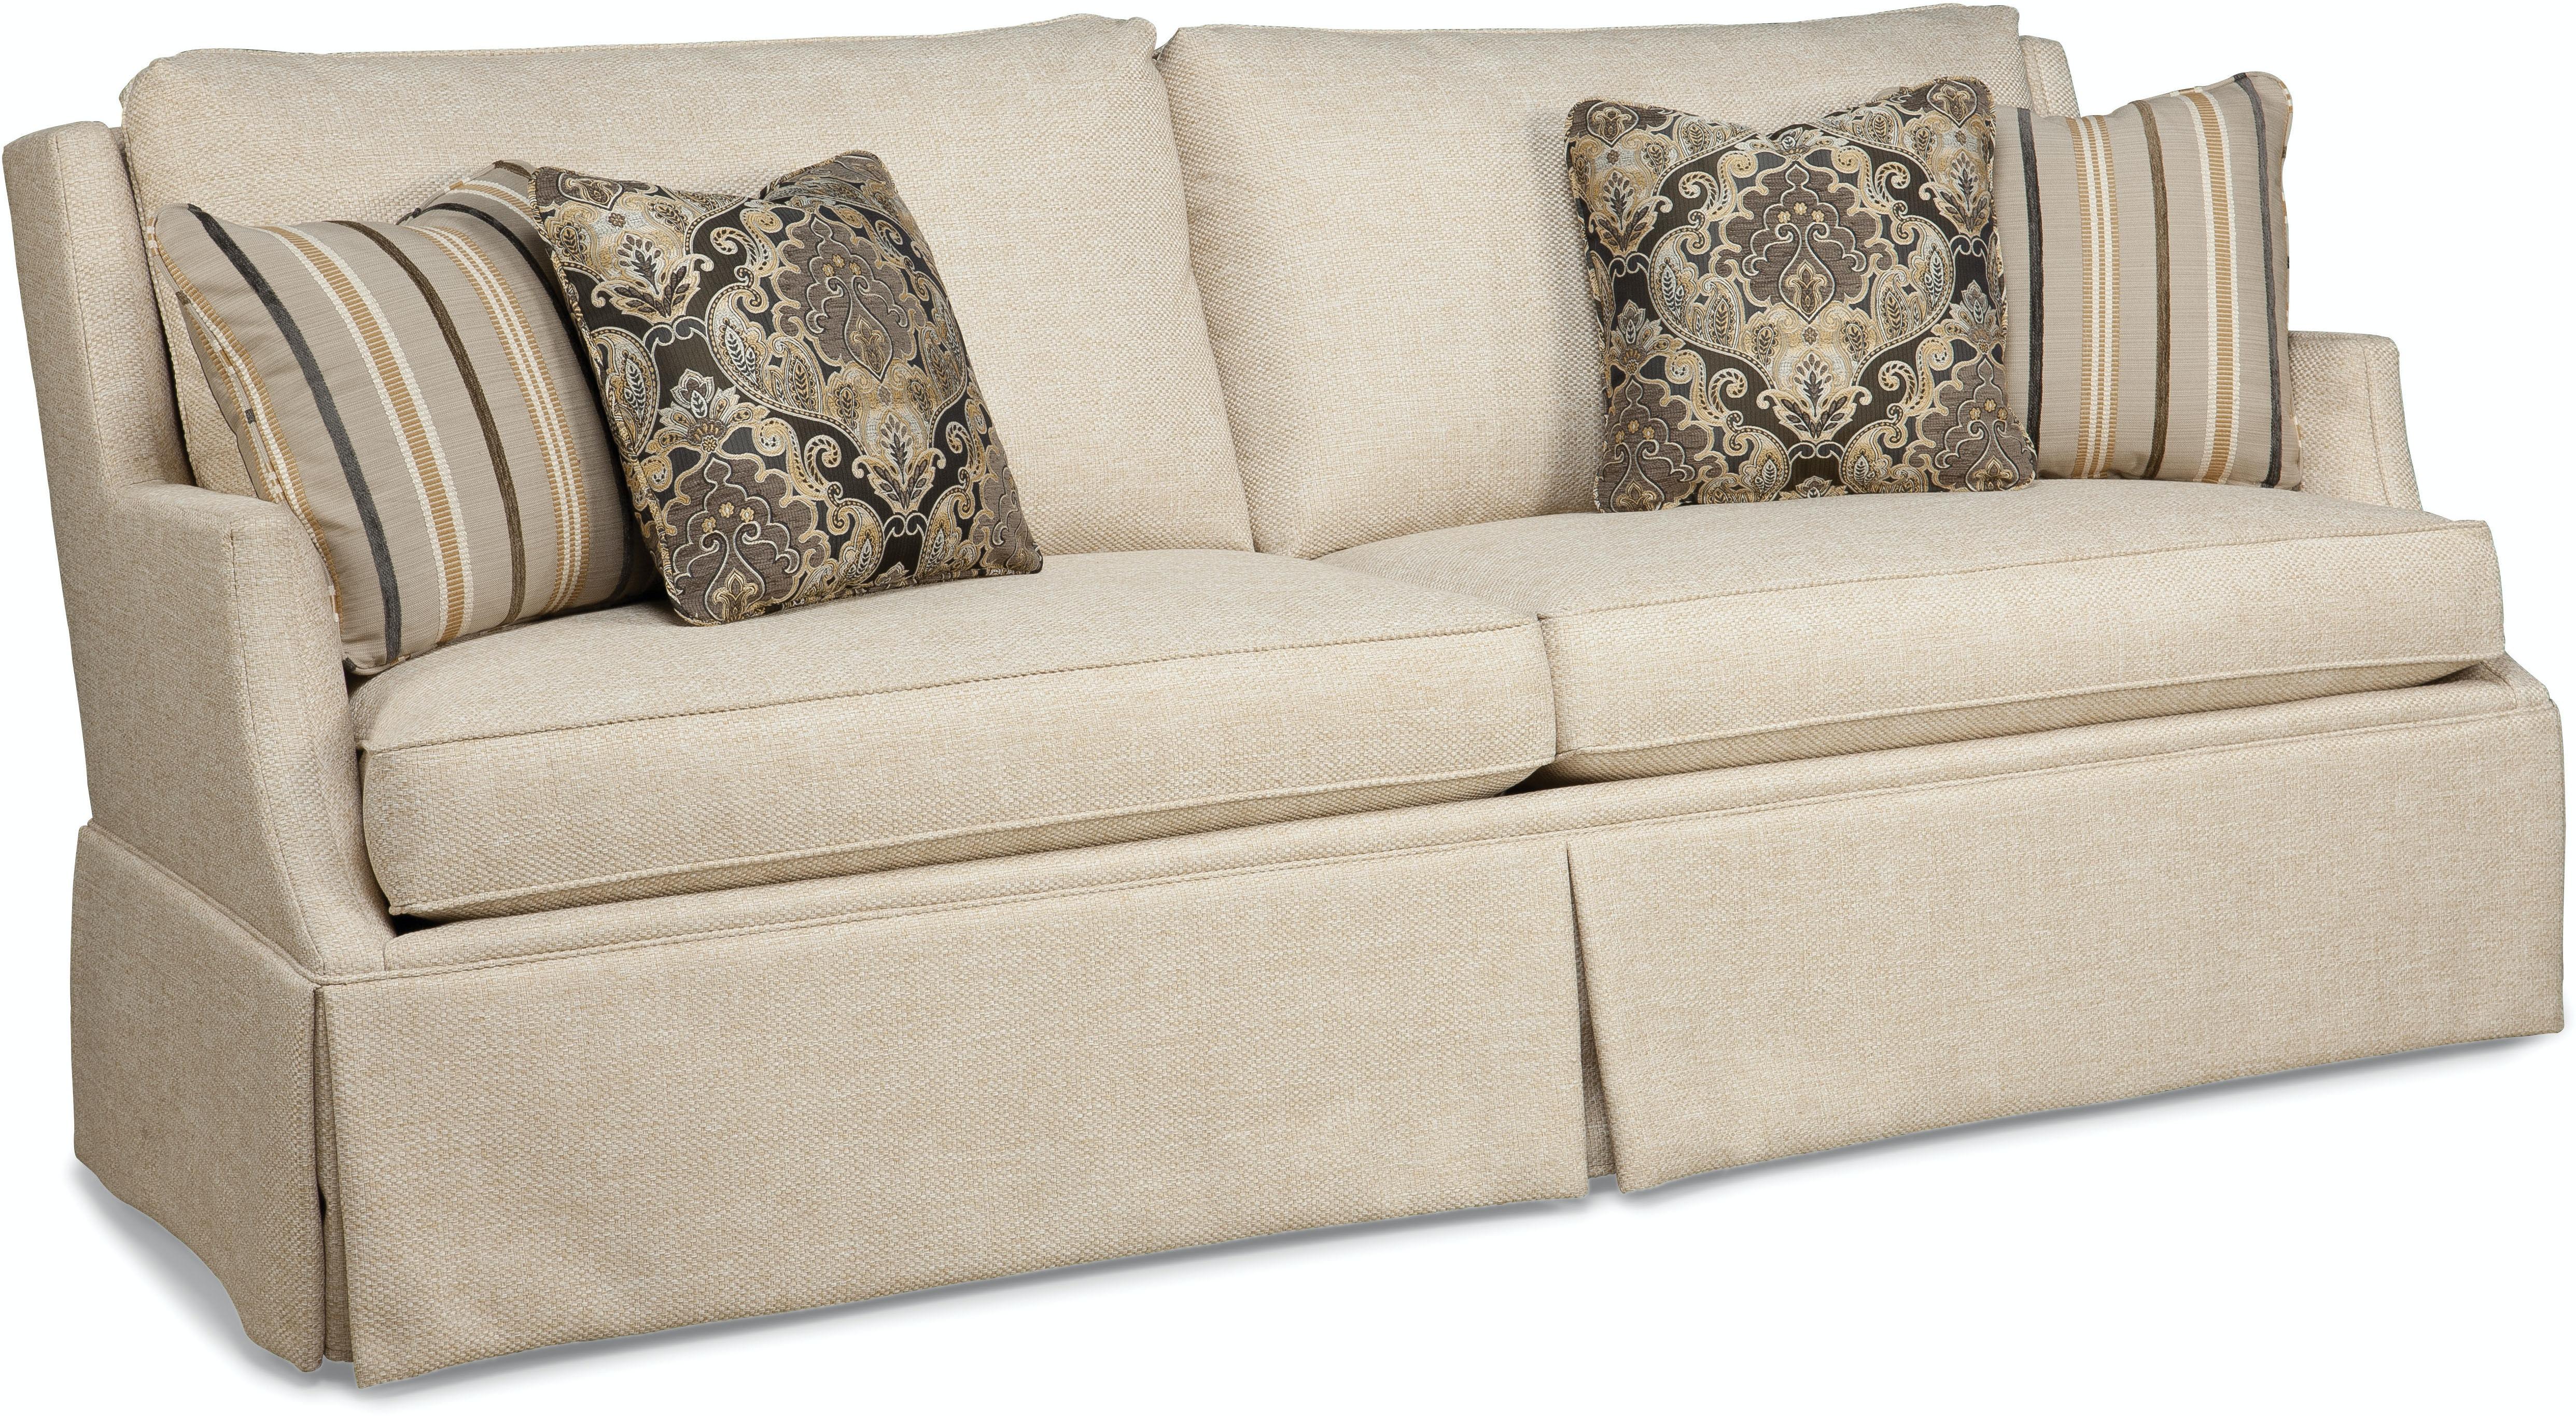 Fairfield Chair pany Living Room Sofa 2726 50 Cherry